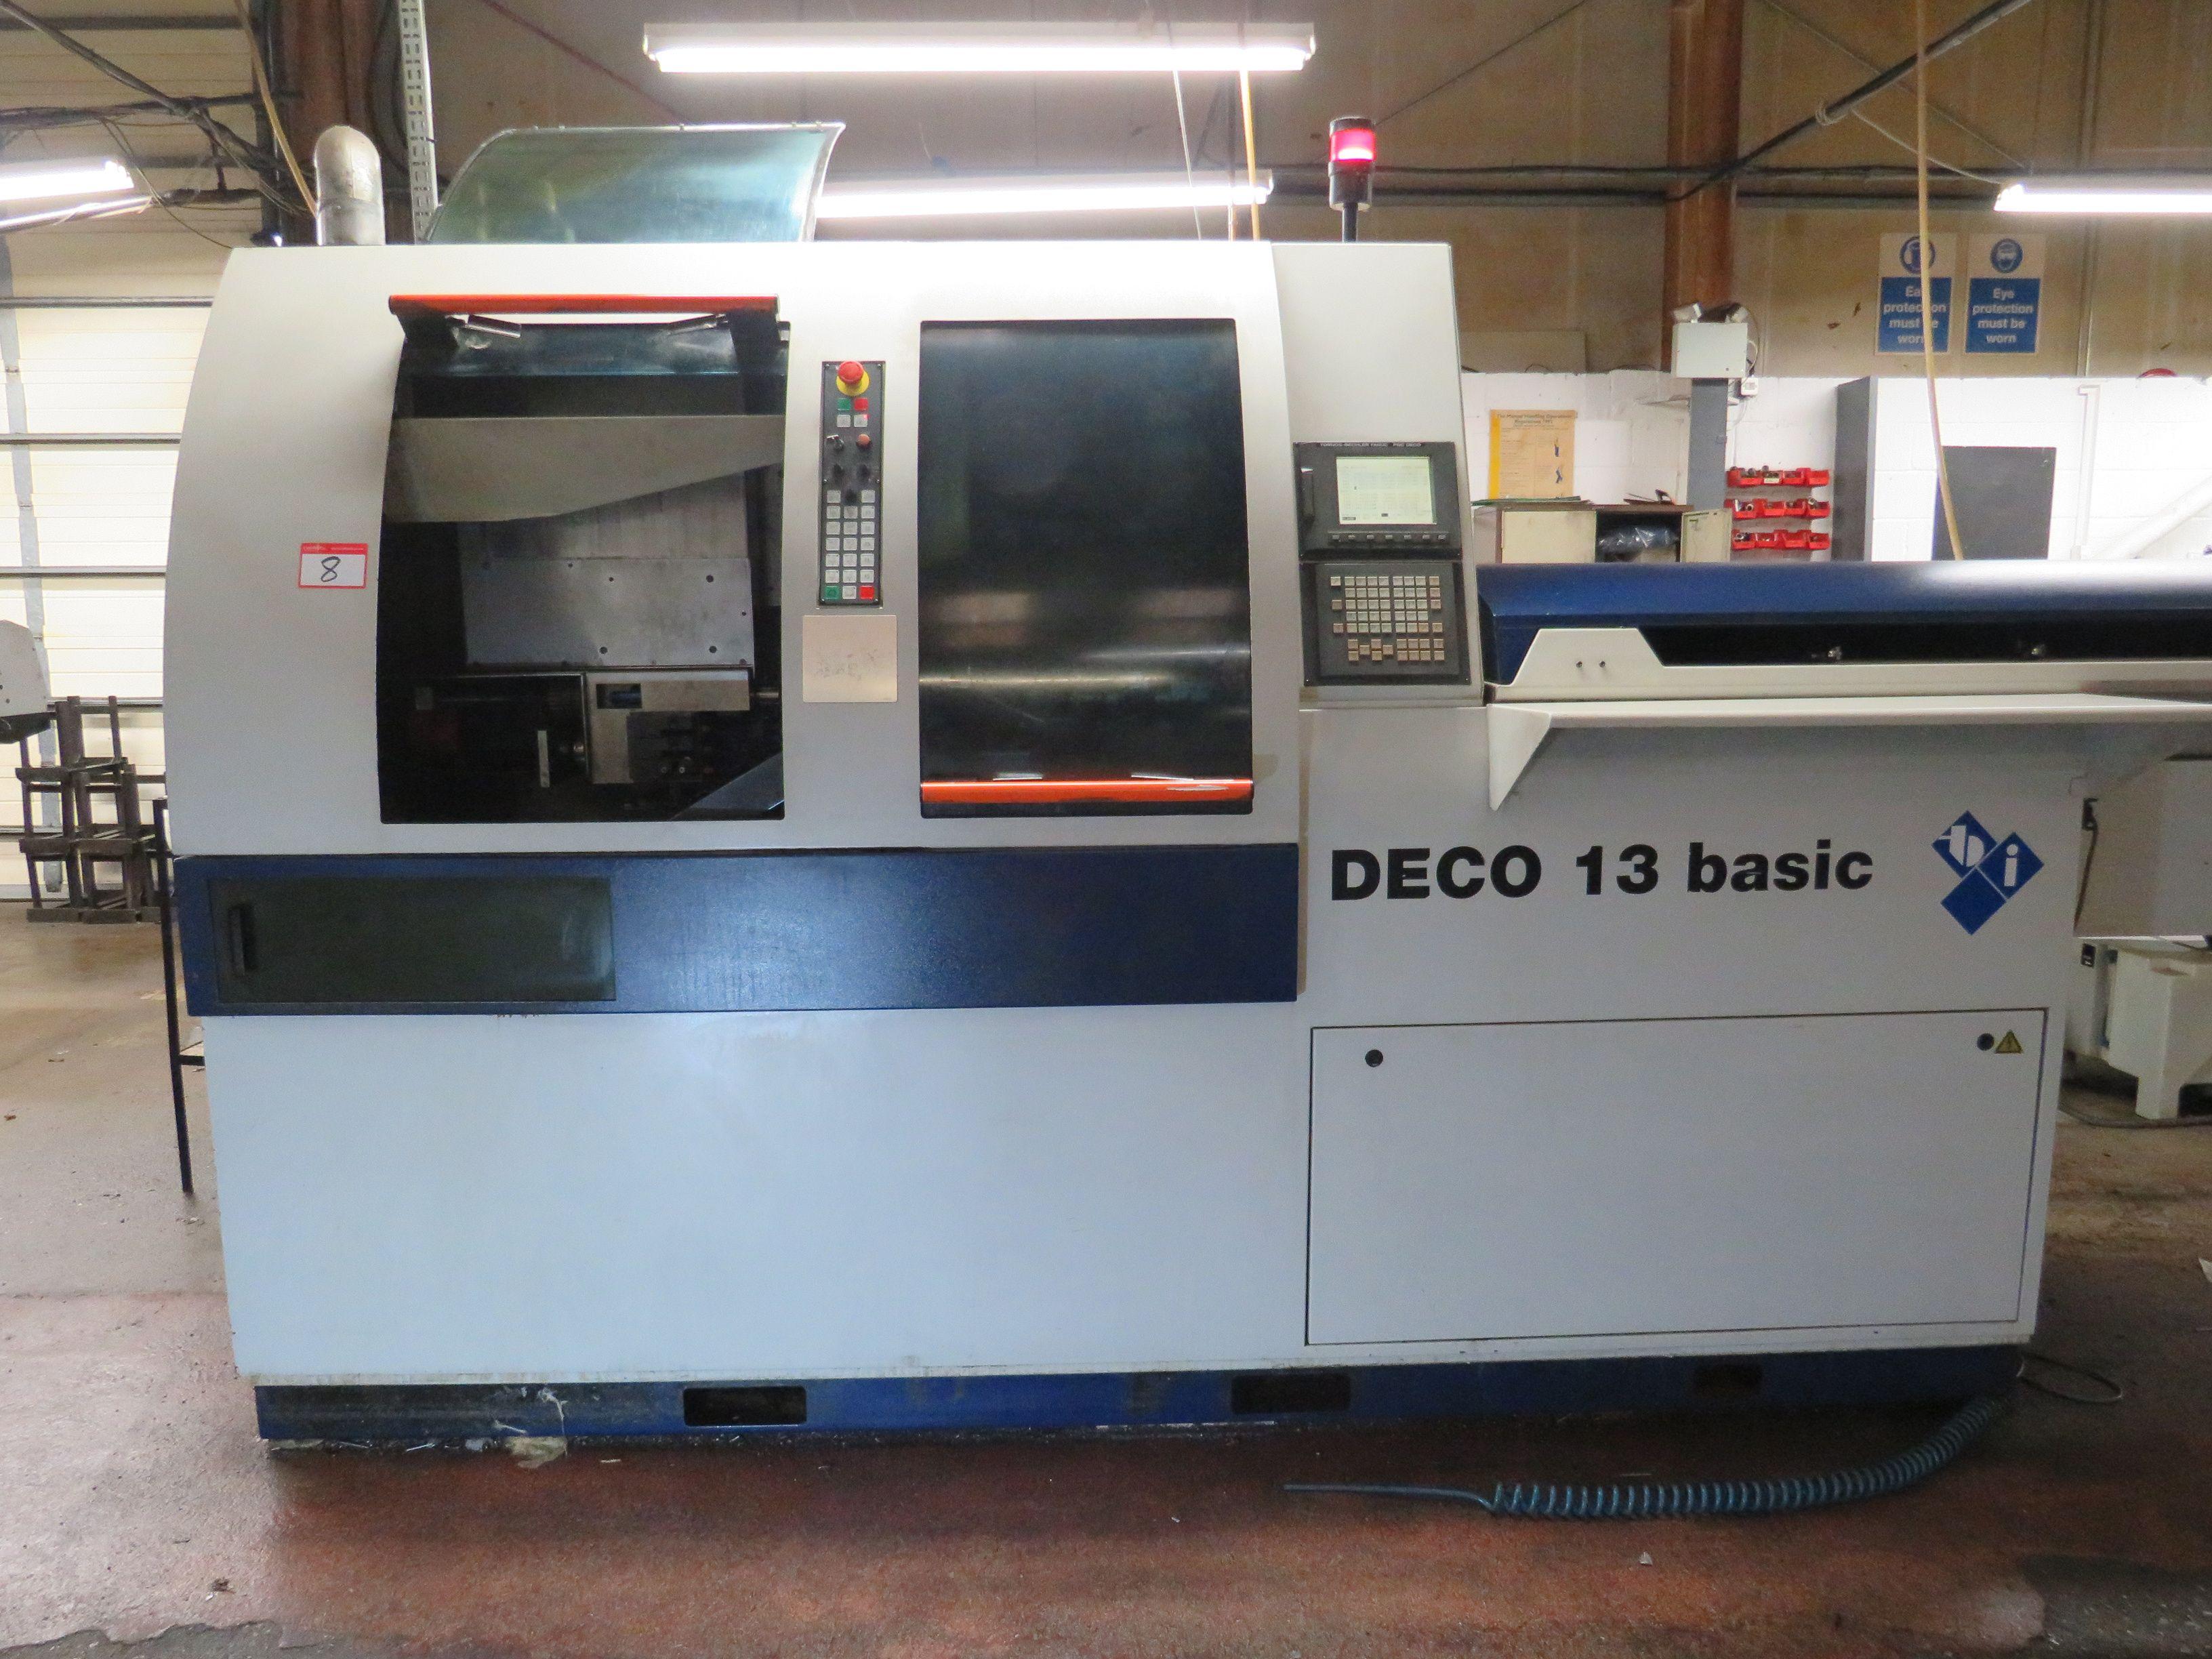 Tornos Deco 13 Basic Schweizer CNC-Drehmaschine